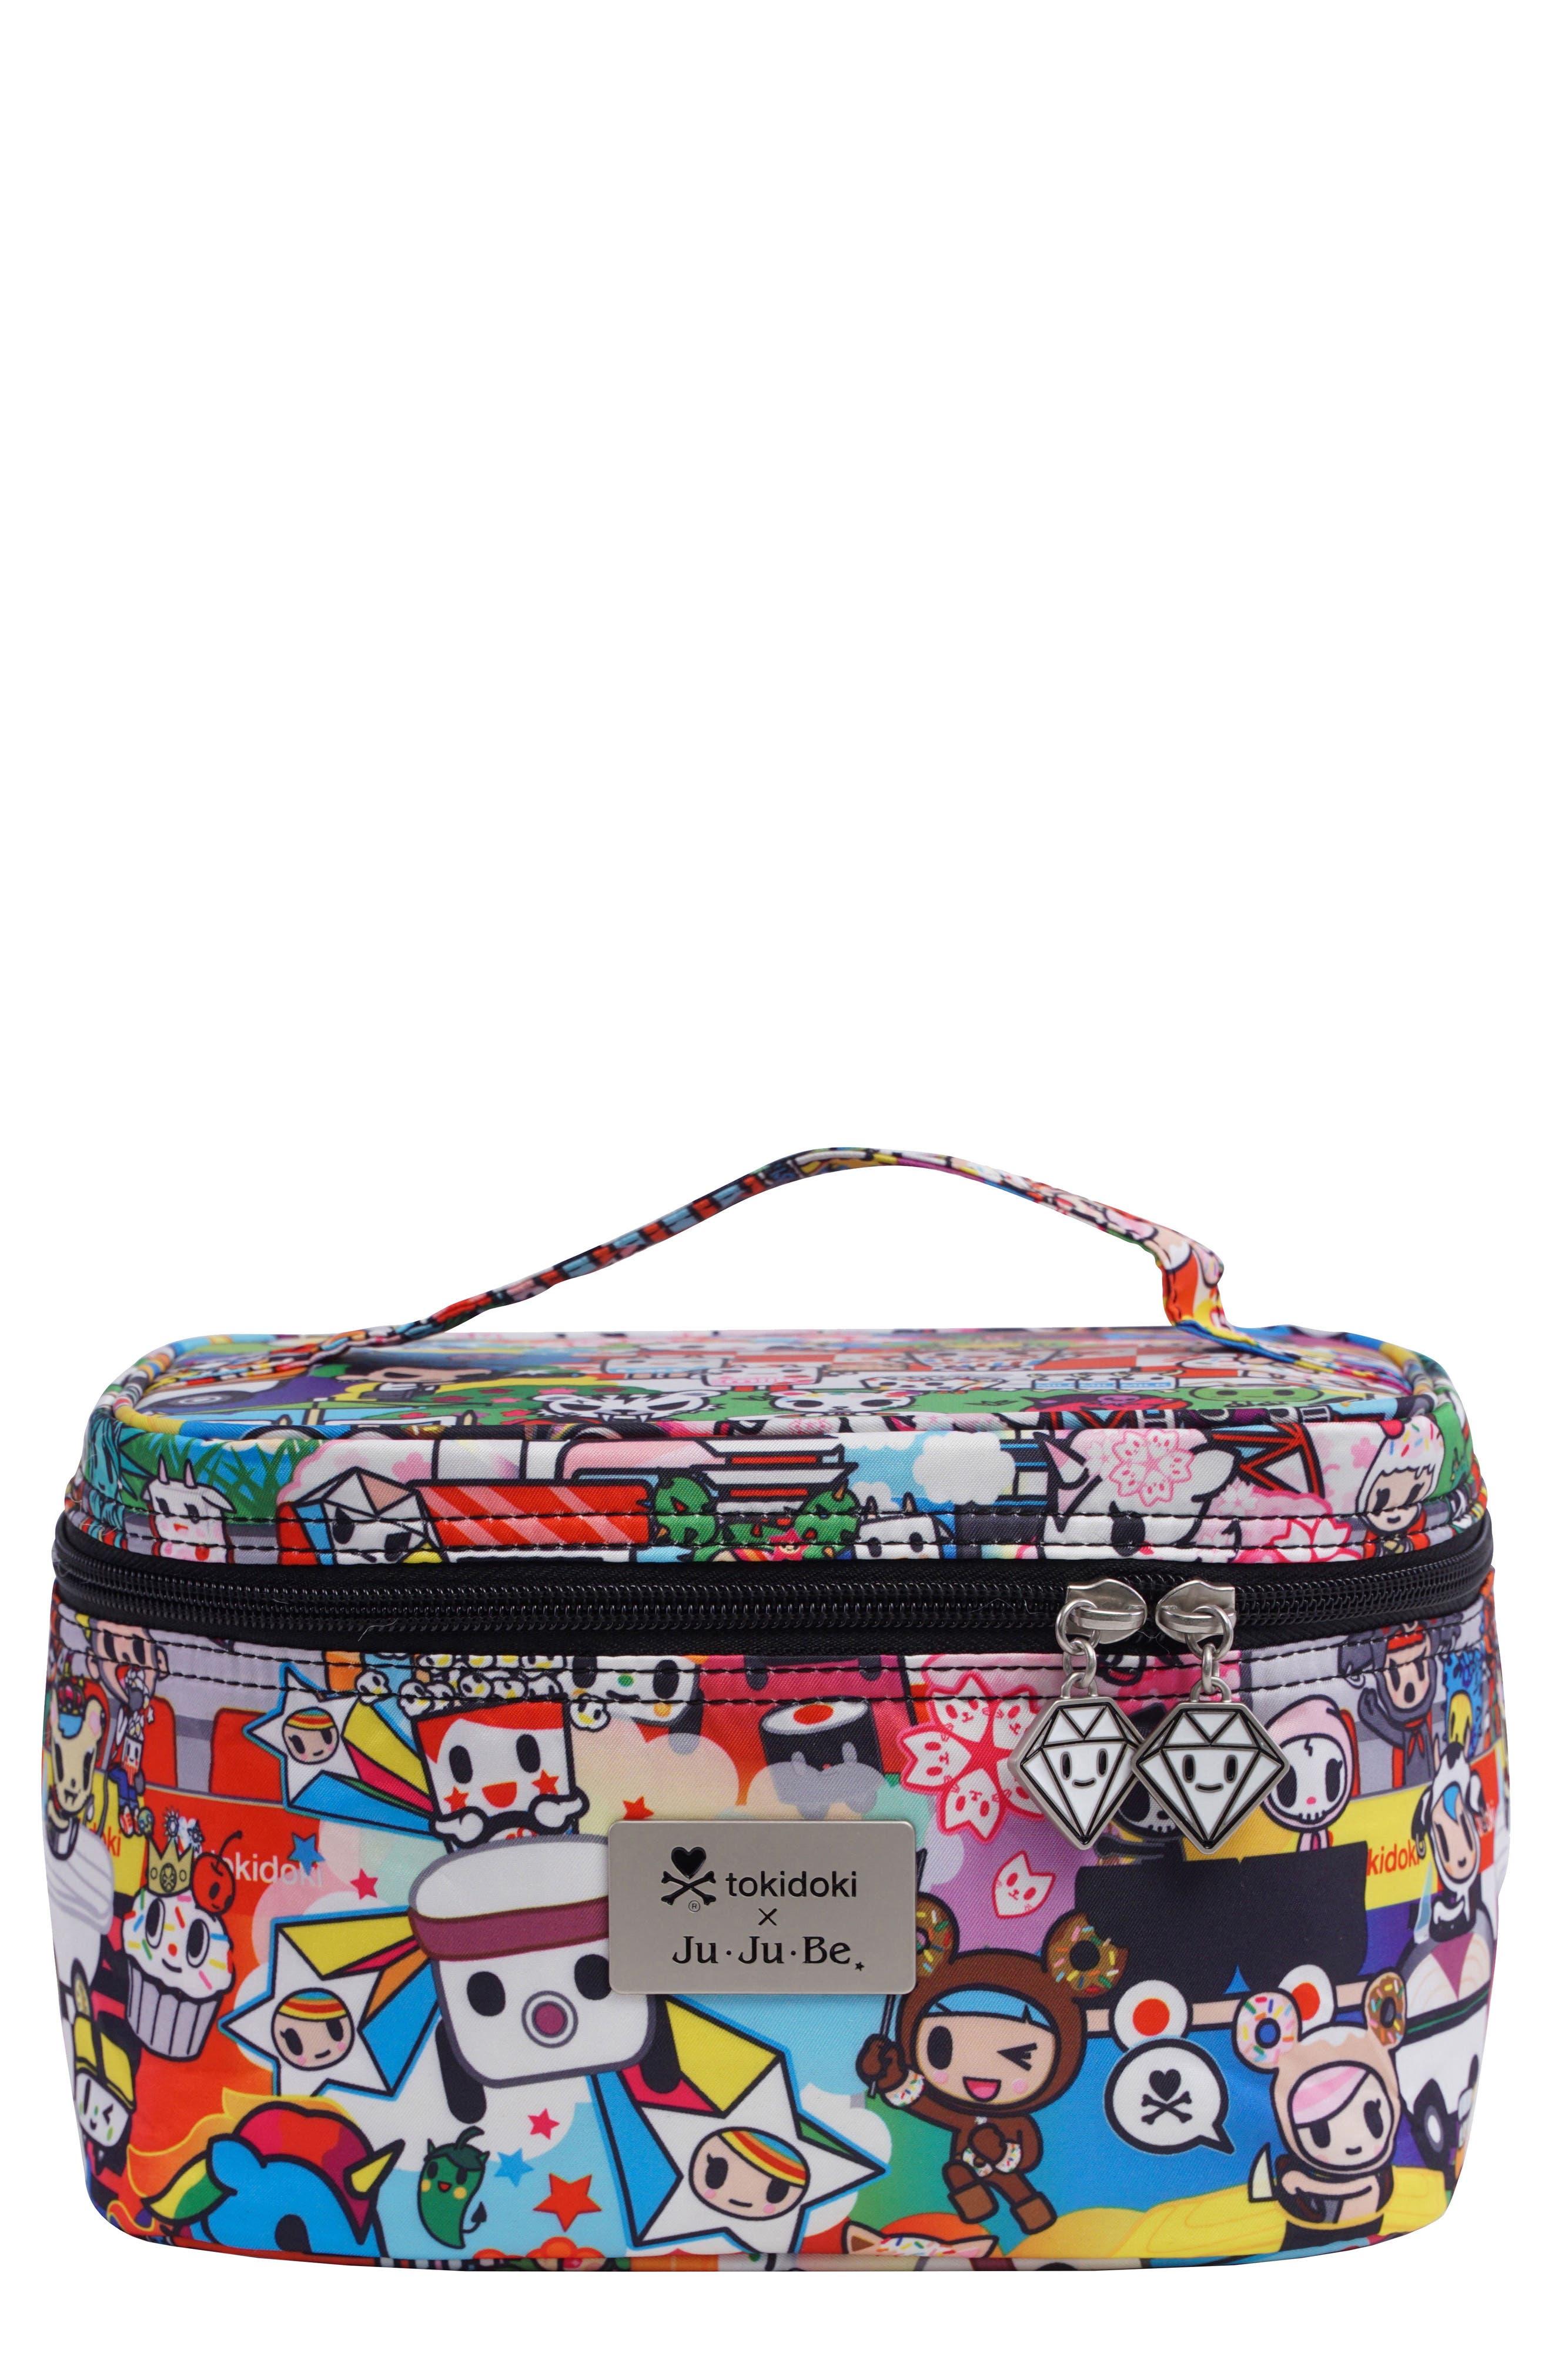 x tokidoki Be Ready Cosmetics Travel Case,                         Main,                         color, SUSHI CARS